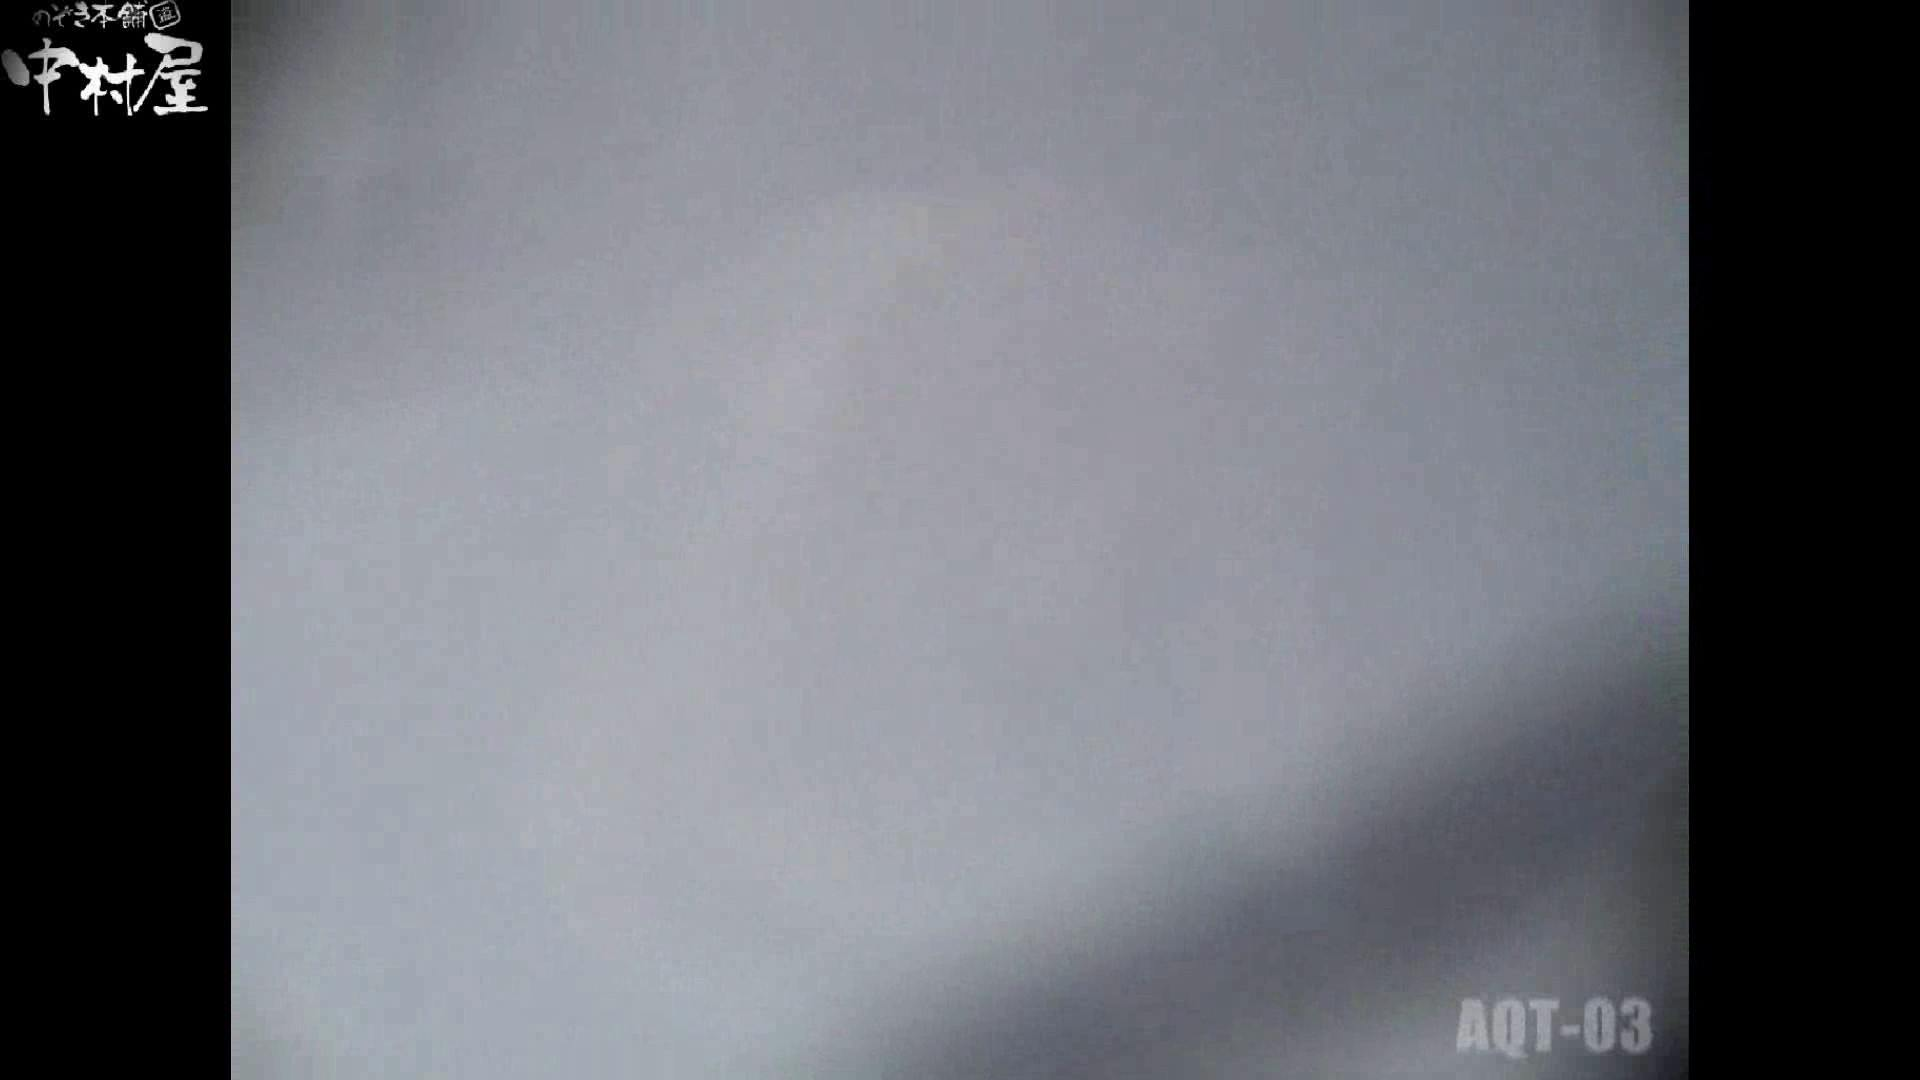 Aquaな露天風呂Vol.867潜入盗撮露天風呂参判湯 其の六 OLすけべ画像 オメコ無修正動画無料 96連発 10